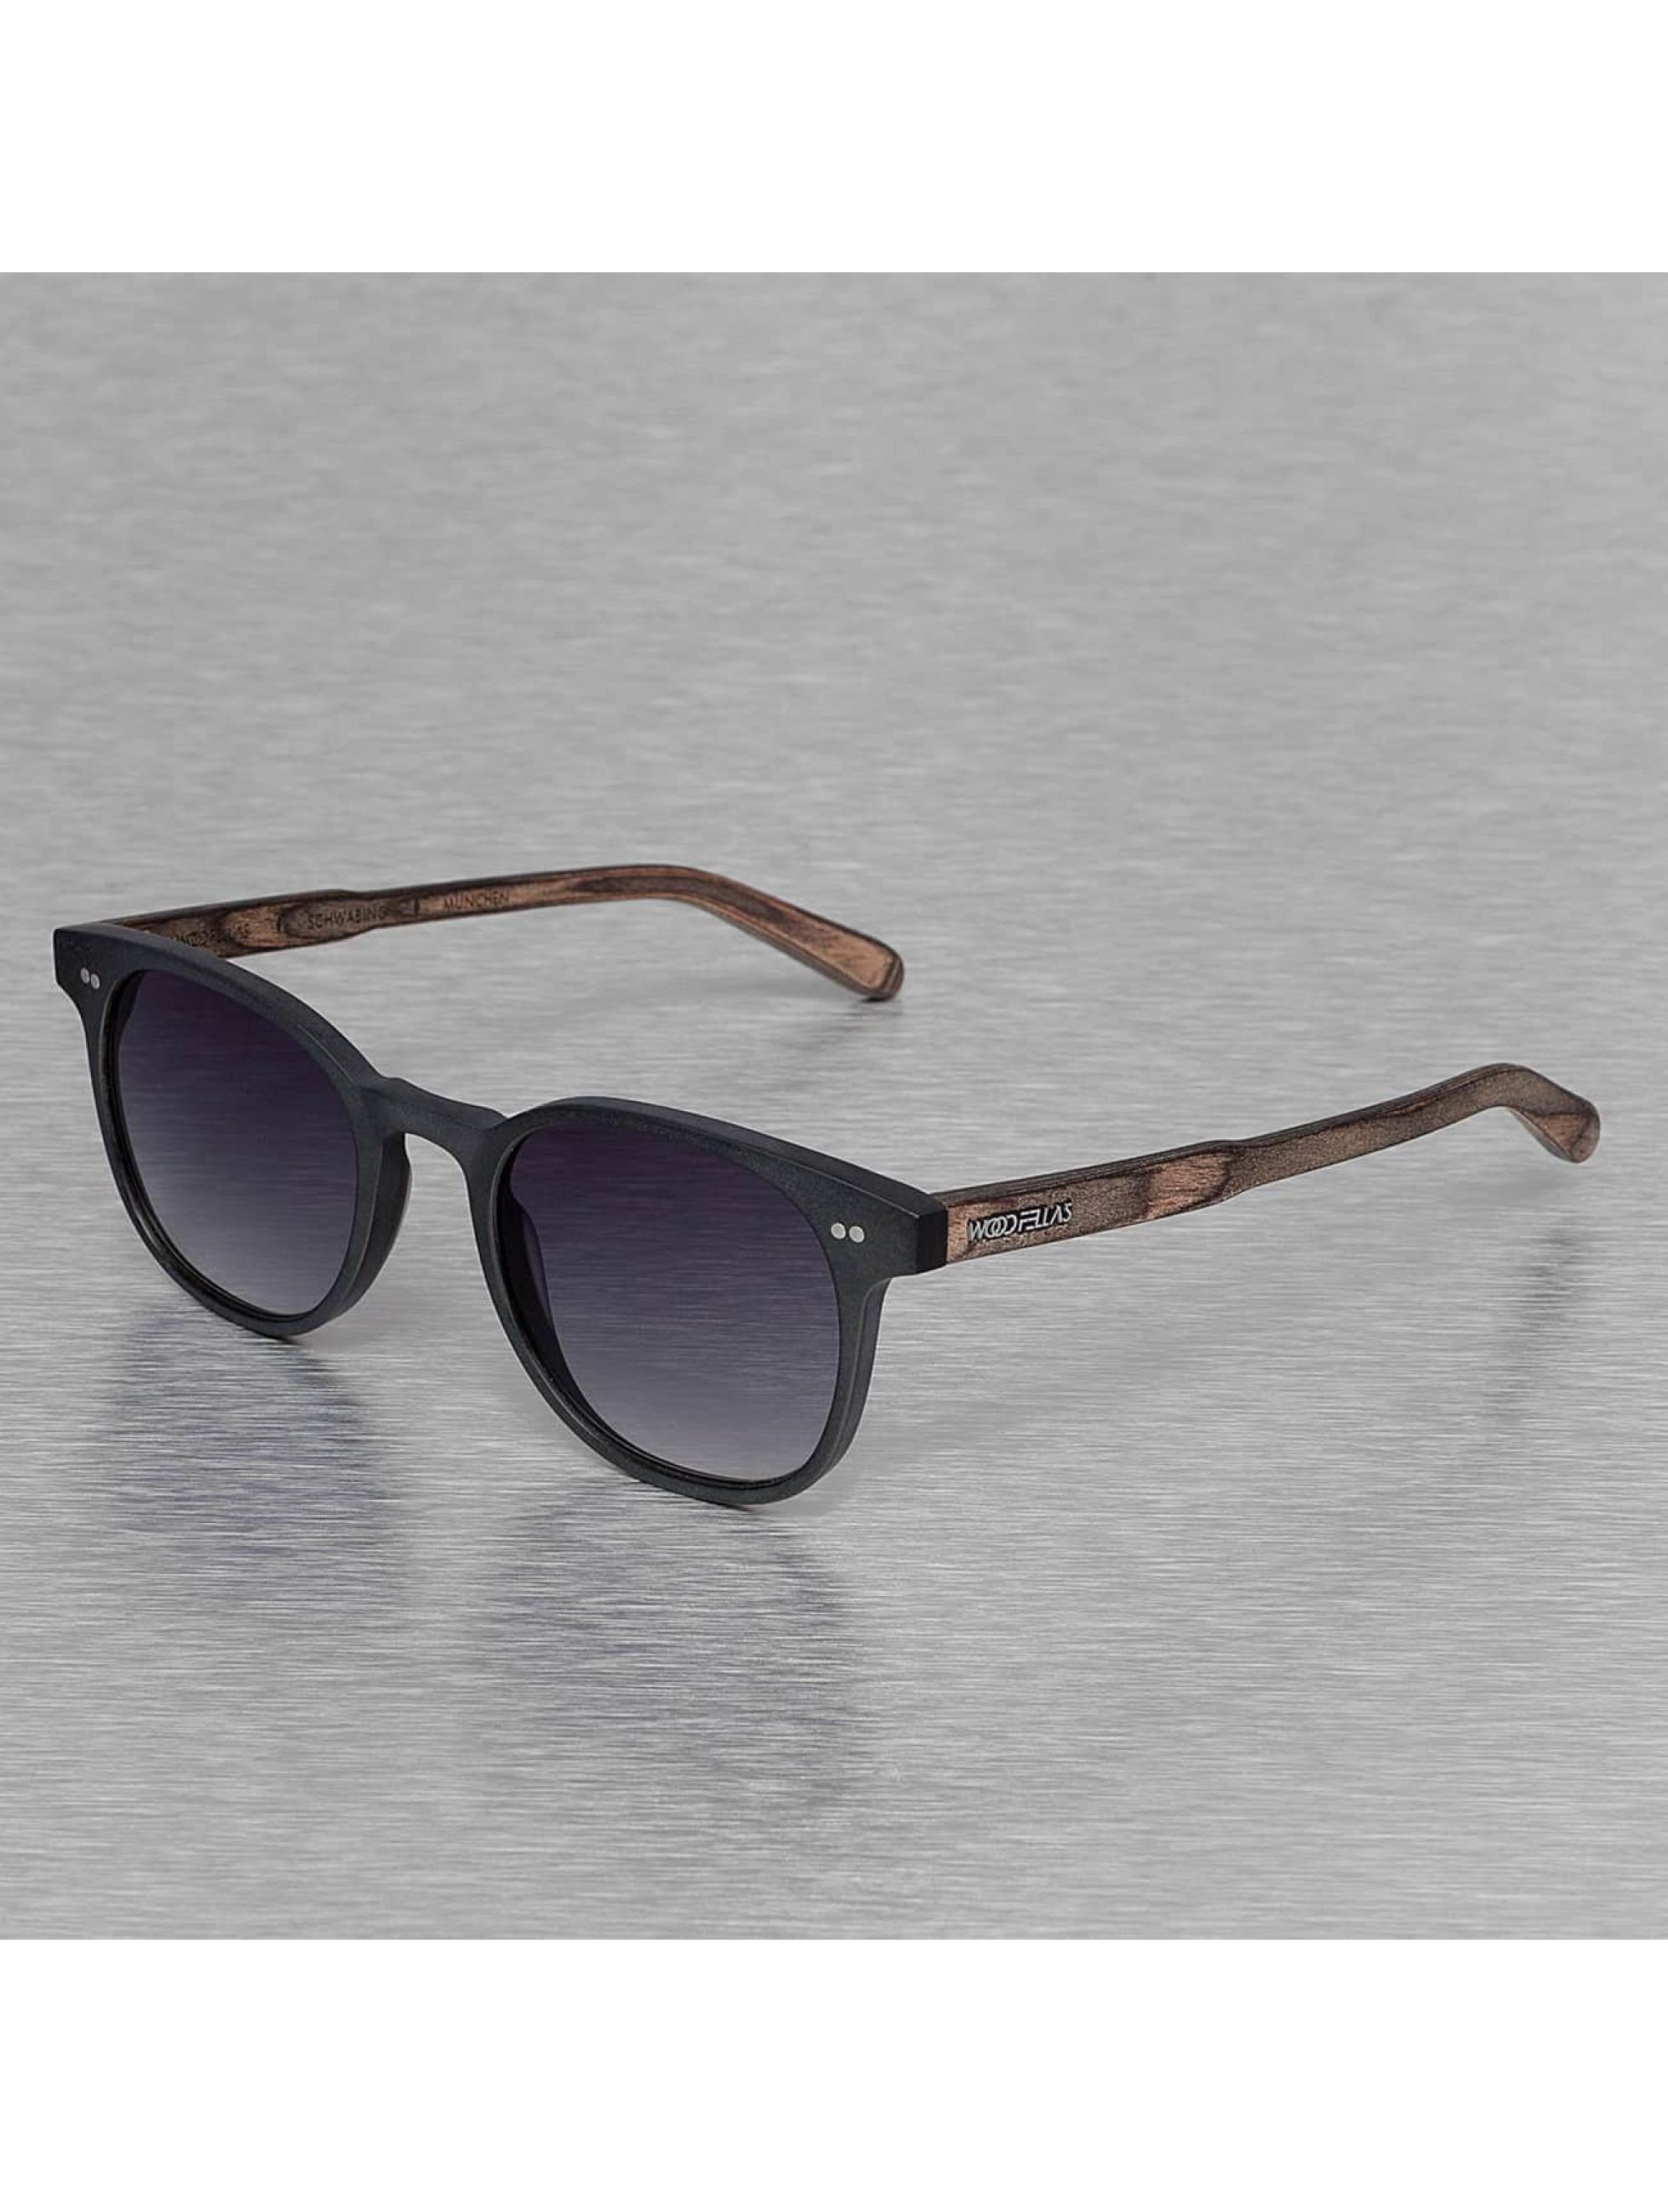 Wood Fellas Eyewear Männer,Frauen Sonnenbrille Eyewear Schwabing Polarized Mirror in schwarz